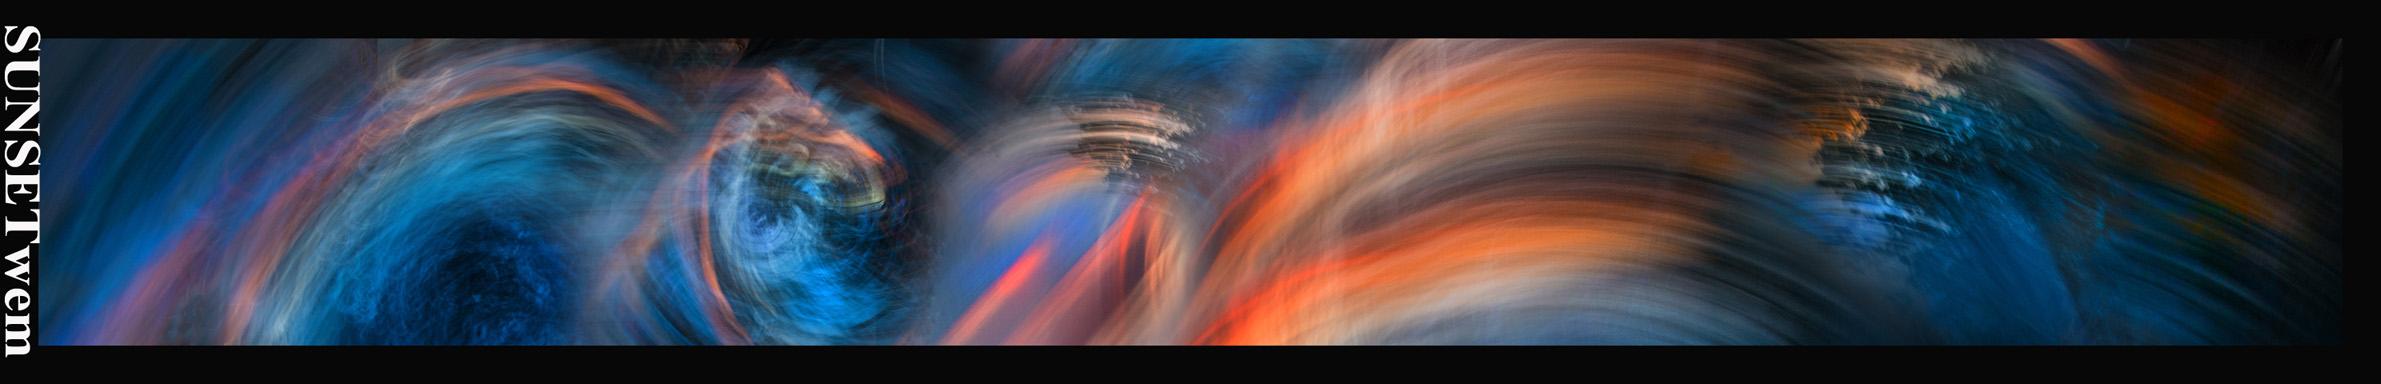 Sun Set lEU 8 x 60